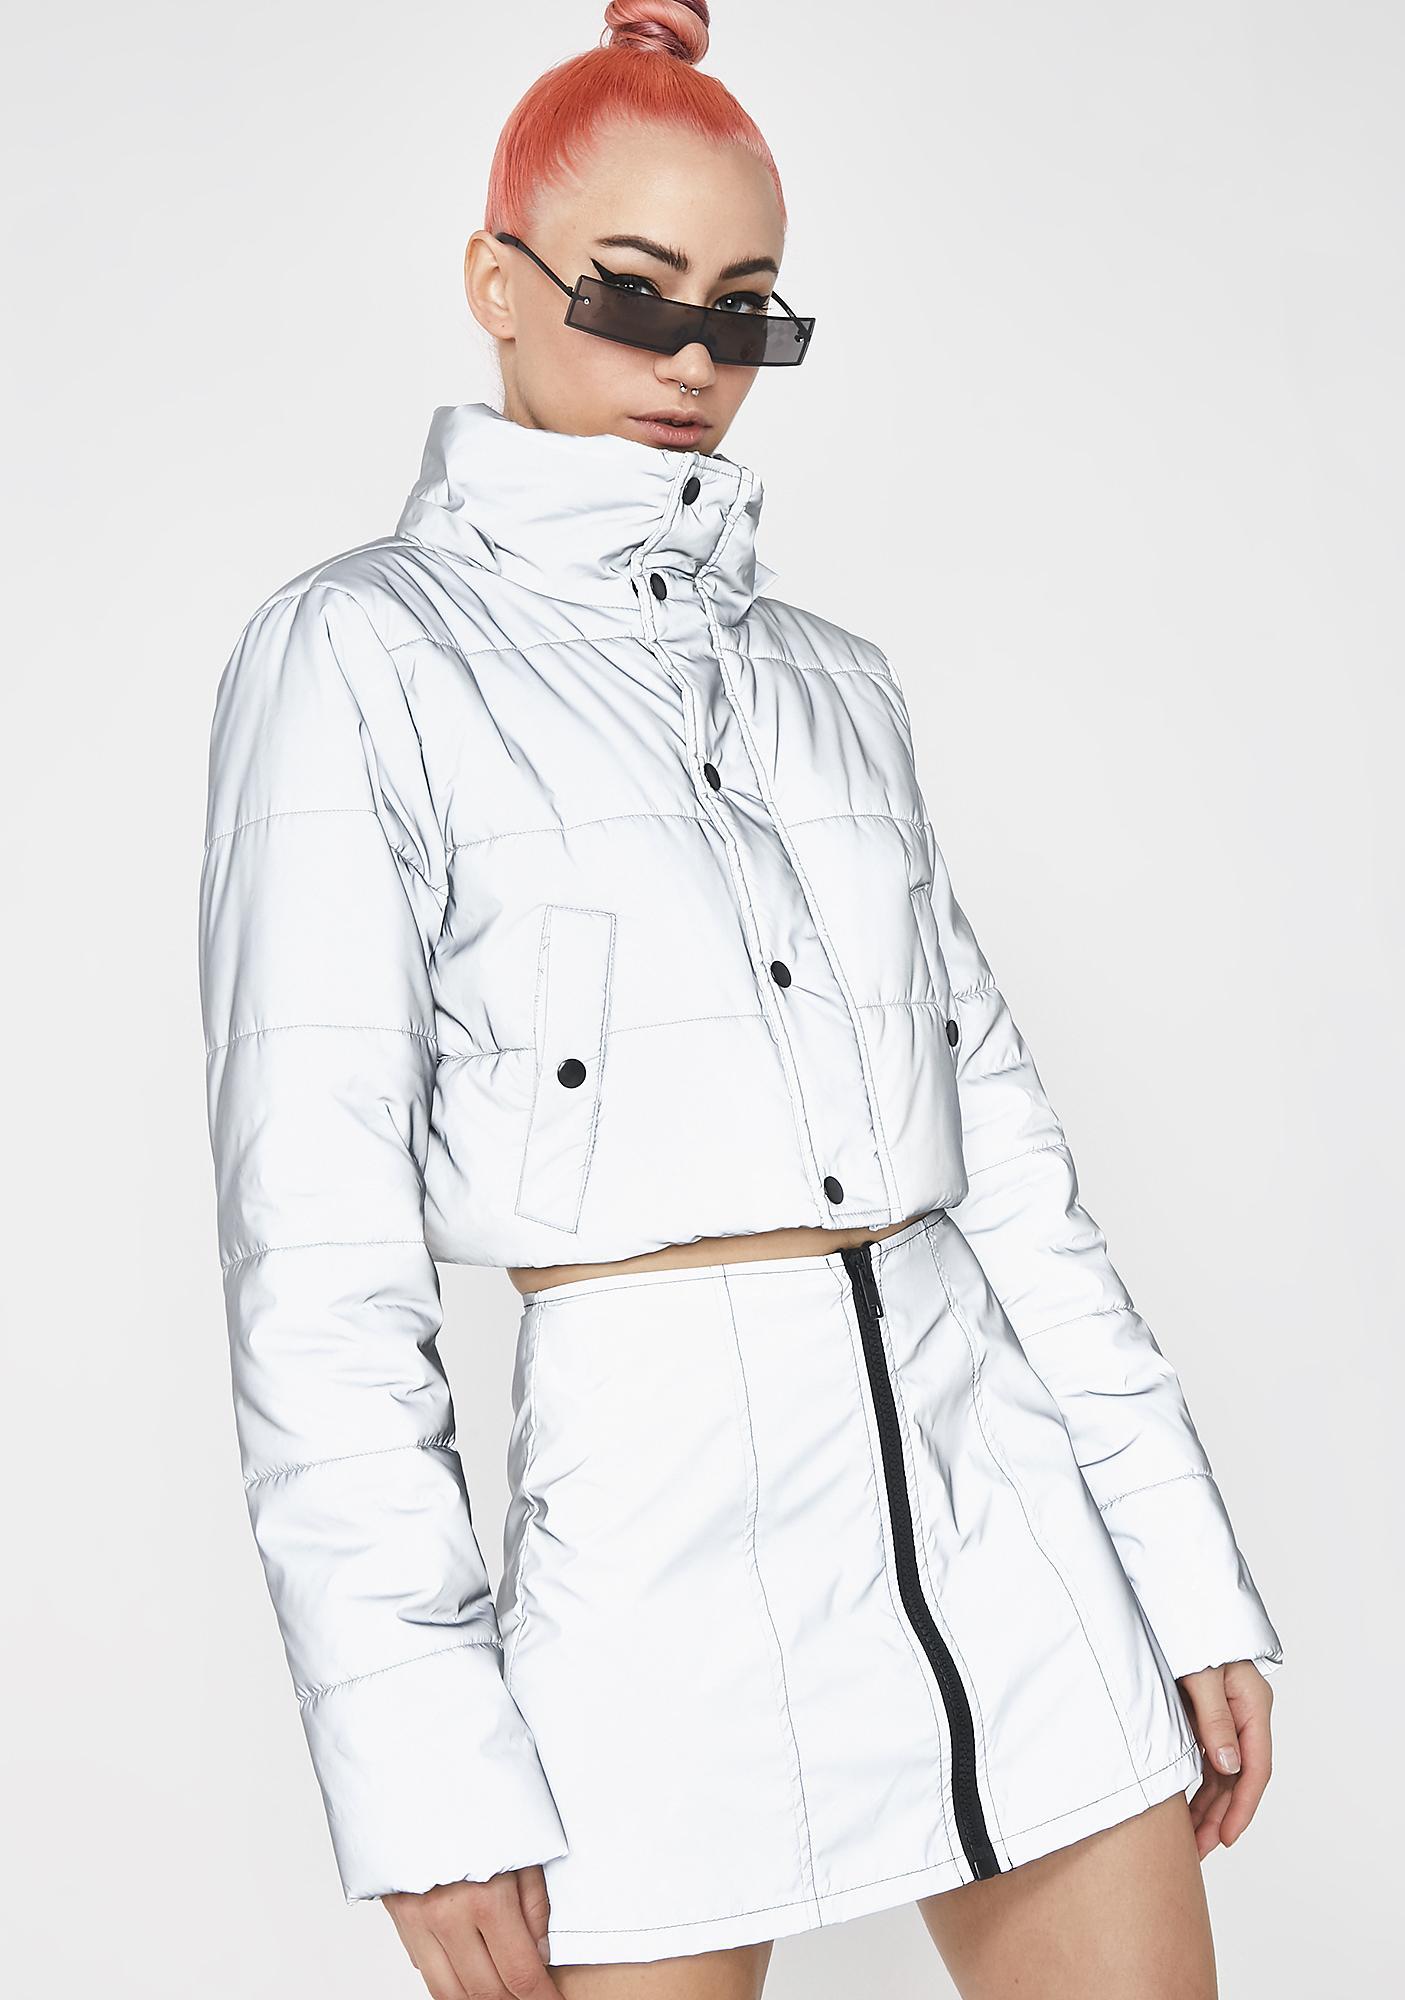 c12a3cab53372 ... Club Exx Savage Signalz Reflective Jacket ...